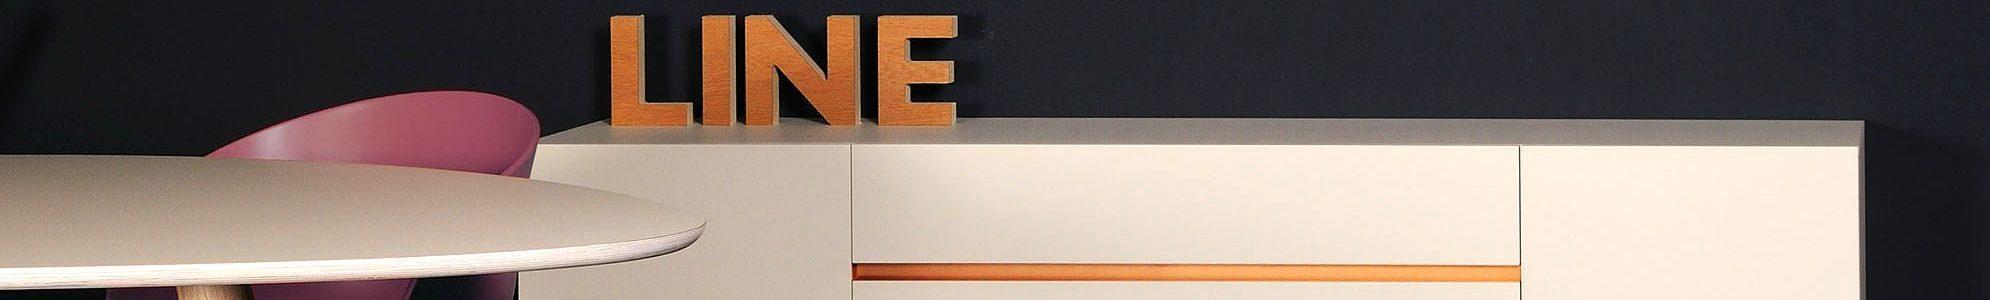 Castelijn-Line 2